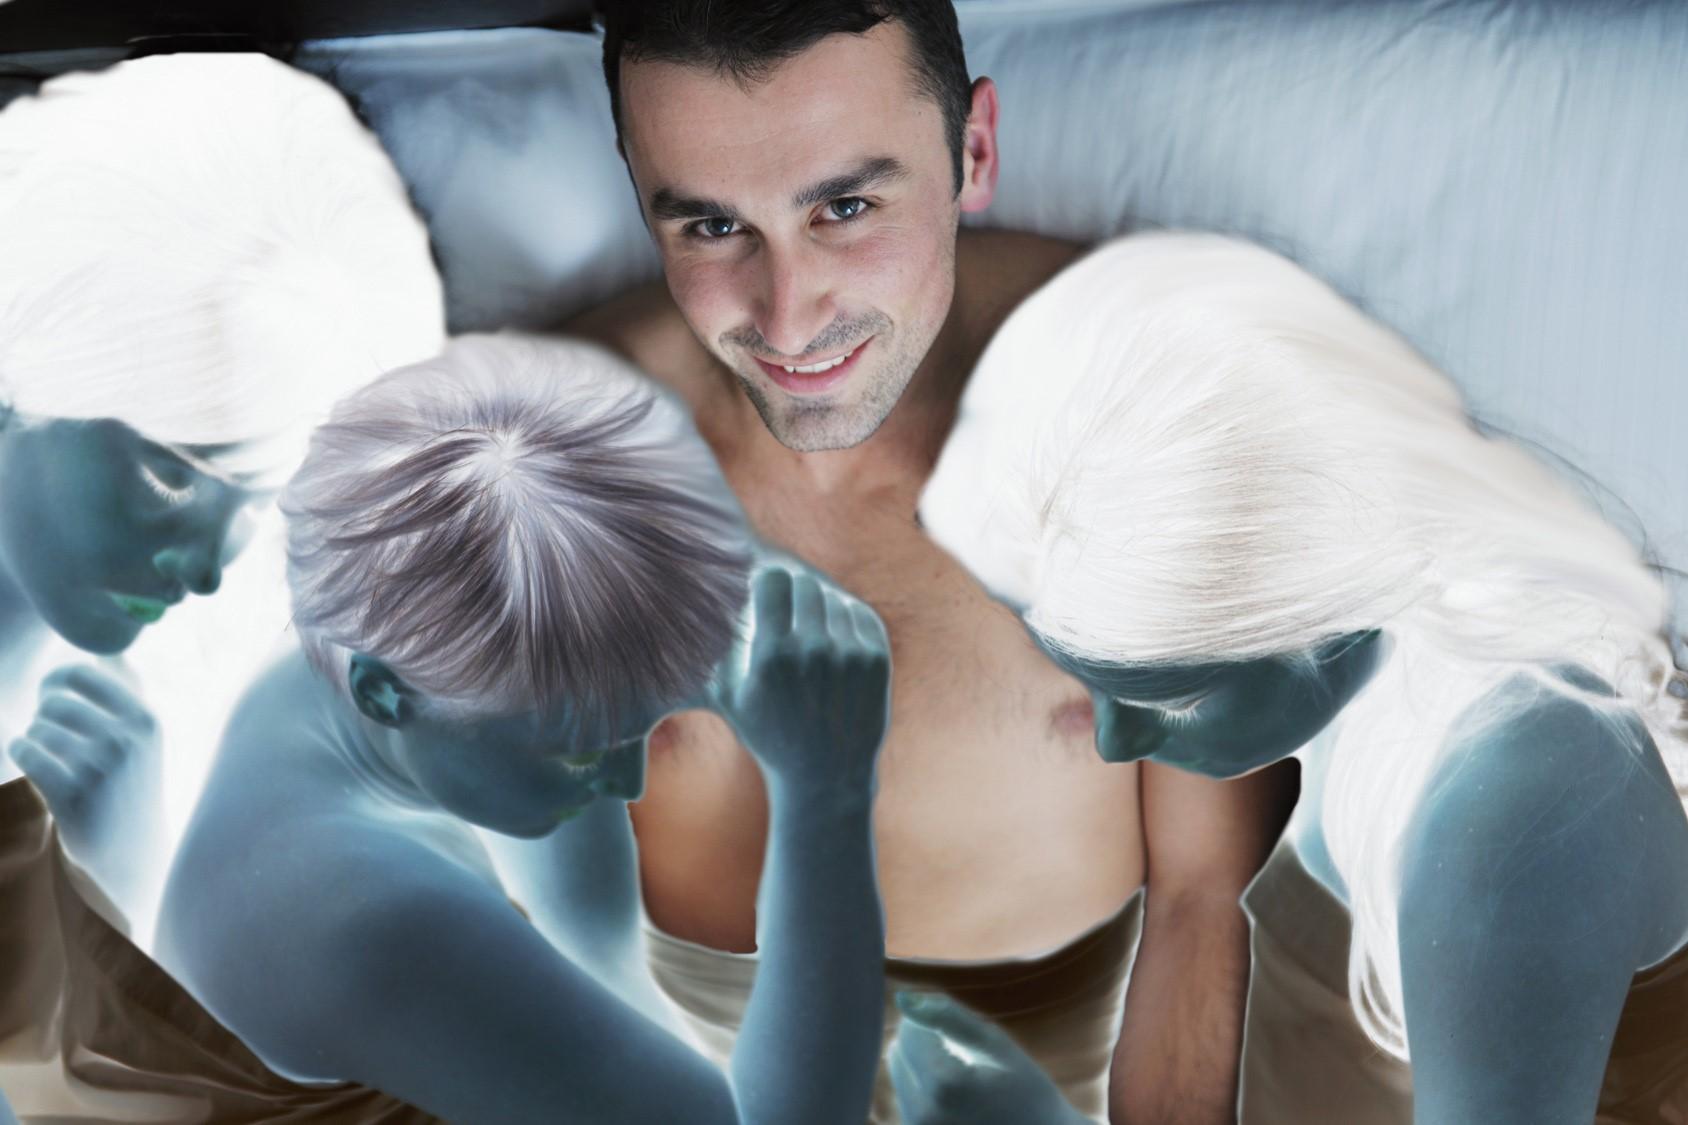 wie ornaniert man porno tantra